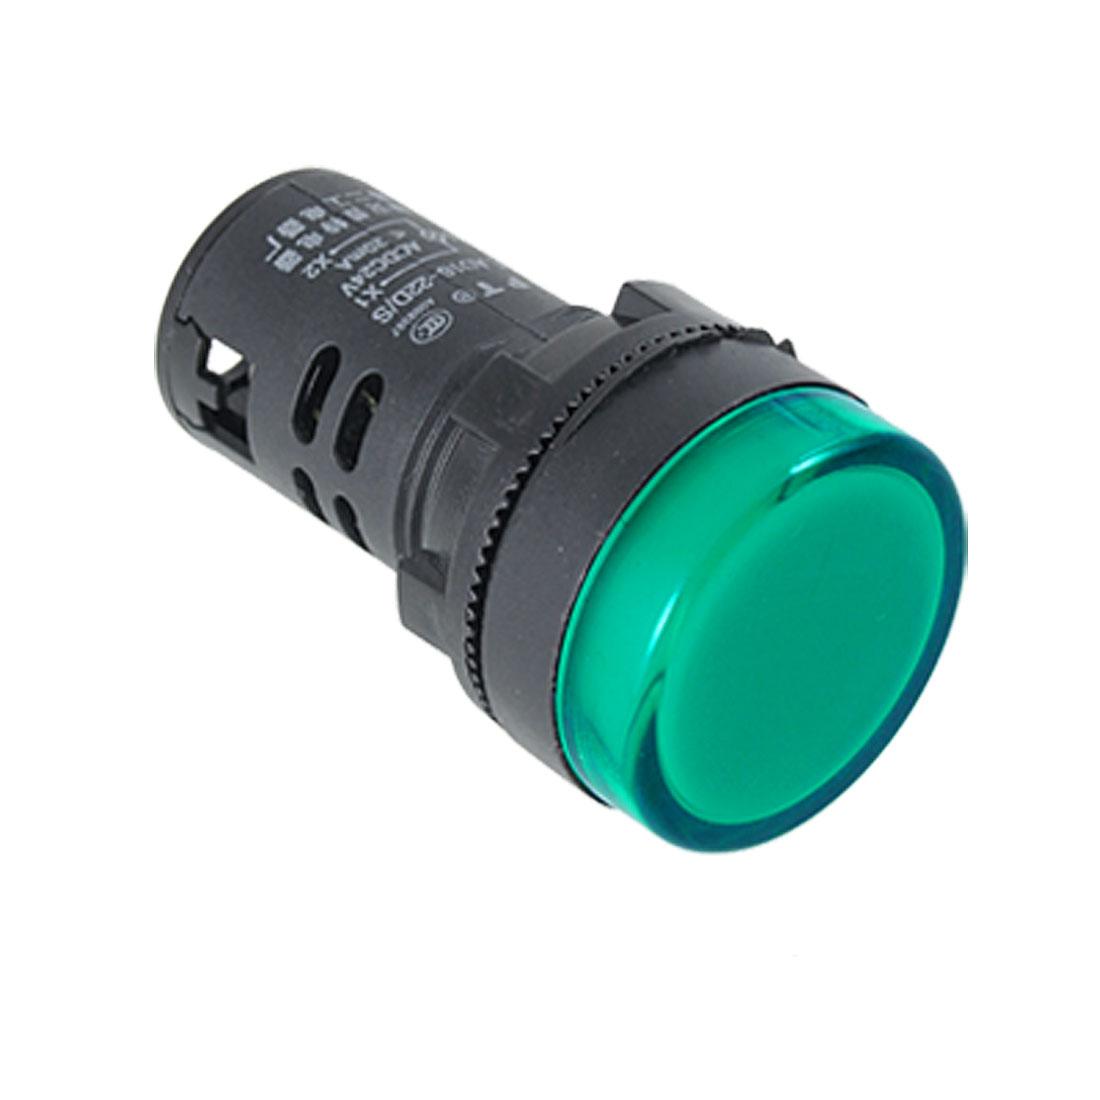 AC 220V LED Panel Power Indicator Light Pilot Signal Lamp AD16-22DS Green Black